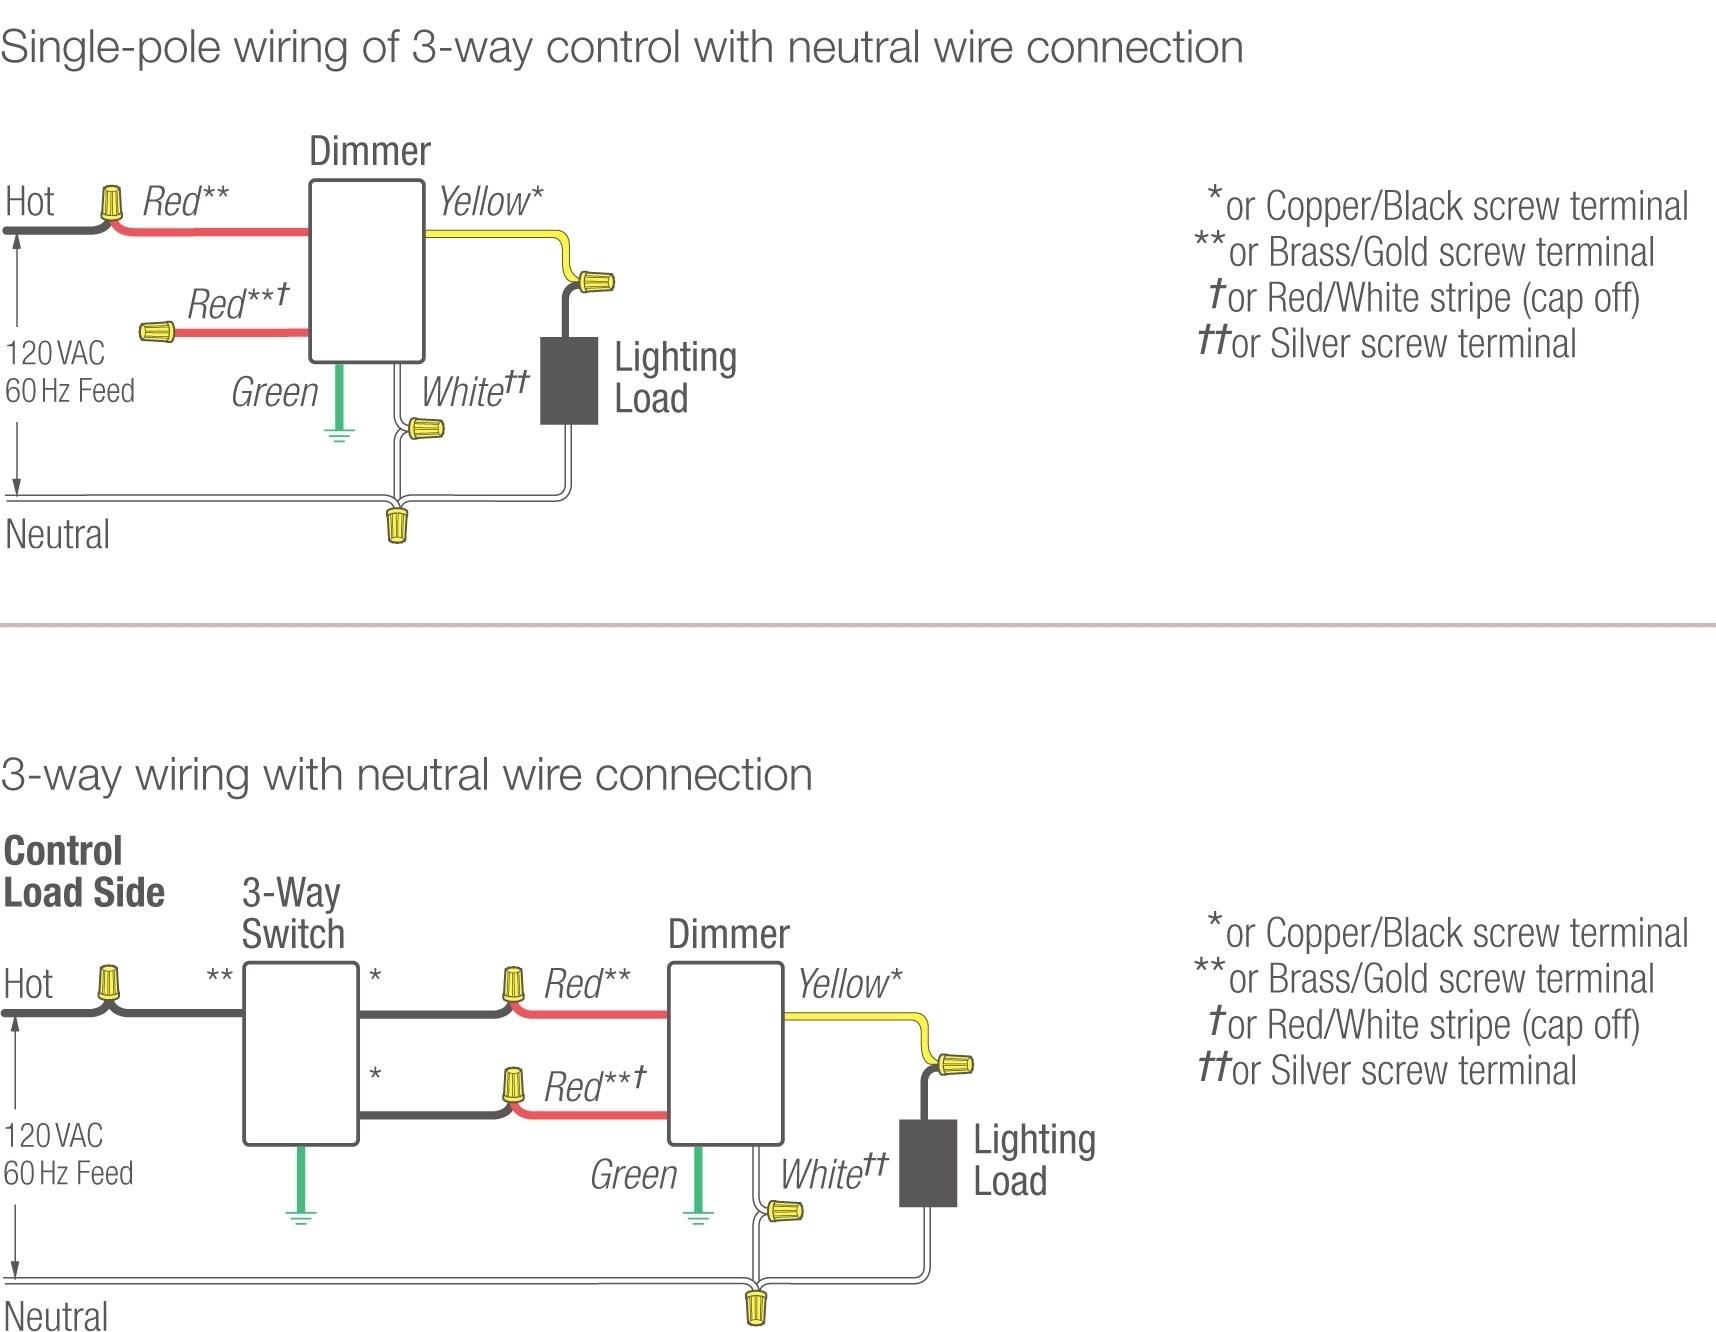 hight resolution of mark 7 ballast wiring diagram wiring diagrams lol dimming ballast wiring diagramn